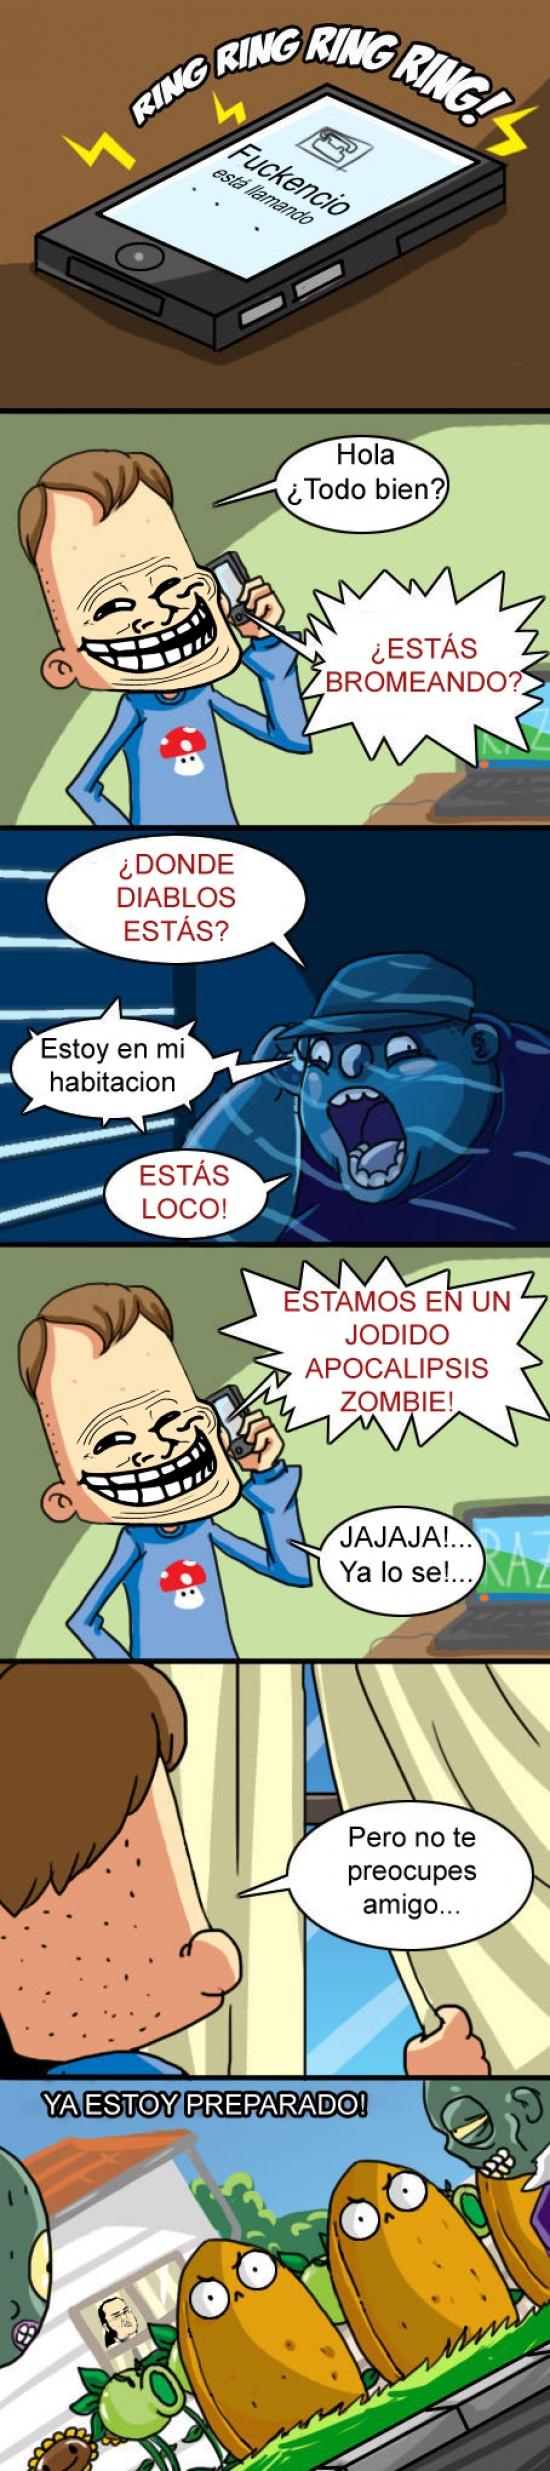 Apocalipsis,Friki,Plants Vs. Zombies,Troll,videojuego